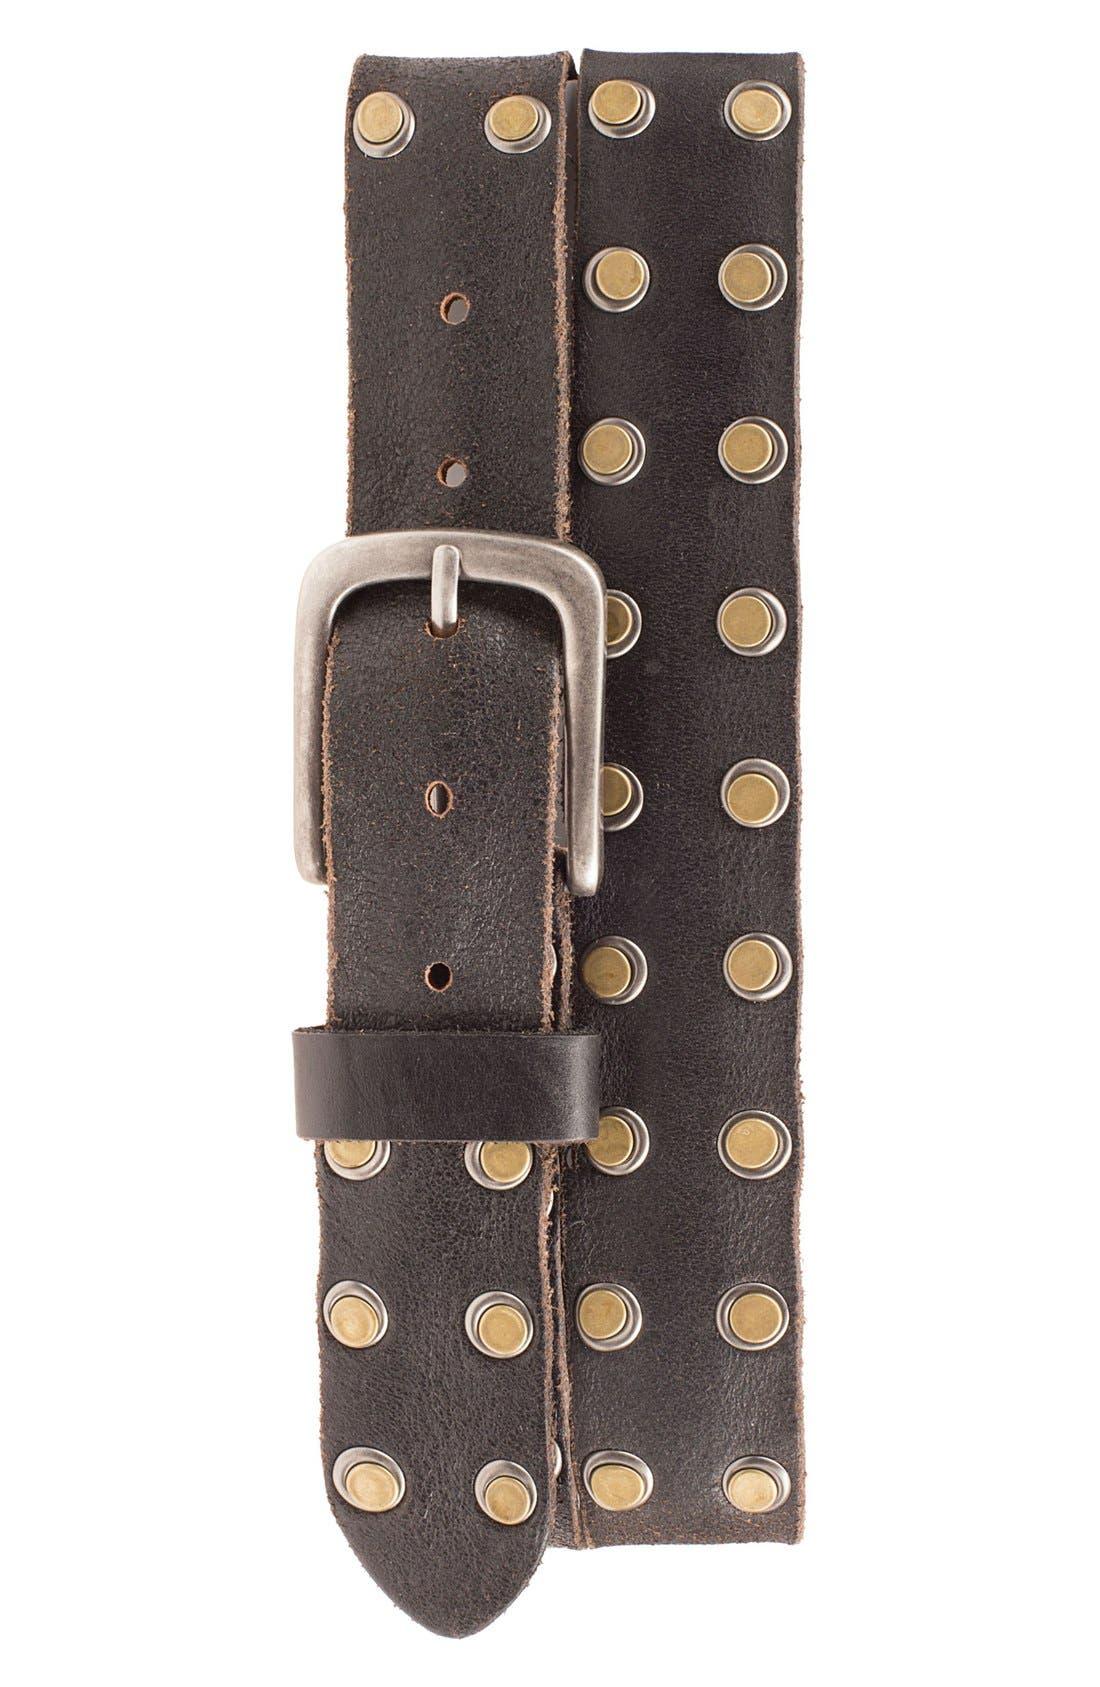 Main Image - Bill Adler 1981 'Outlaw' Leather Belt